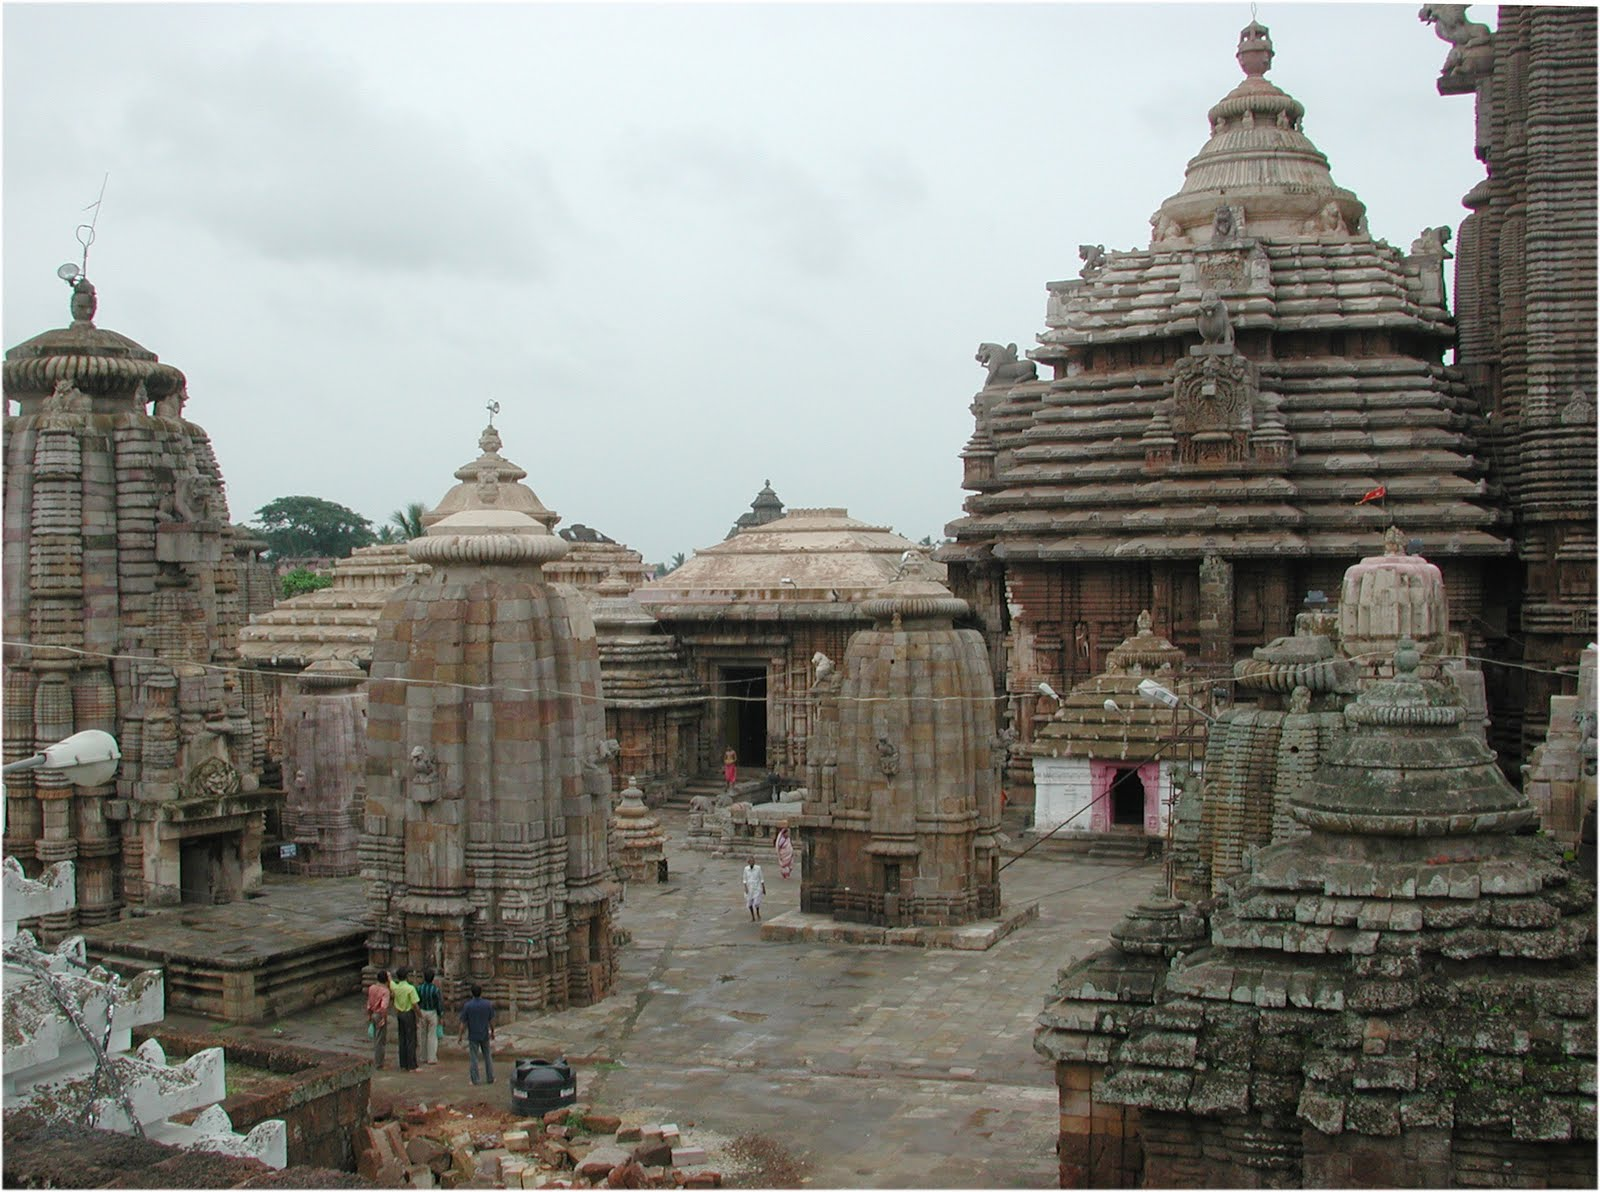 Tourism of odisha lingaraj temple of bhubaneswar for Architecture design for home in odisha